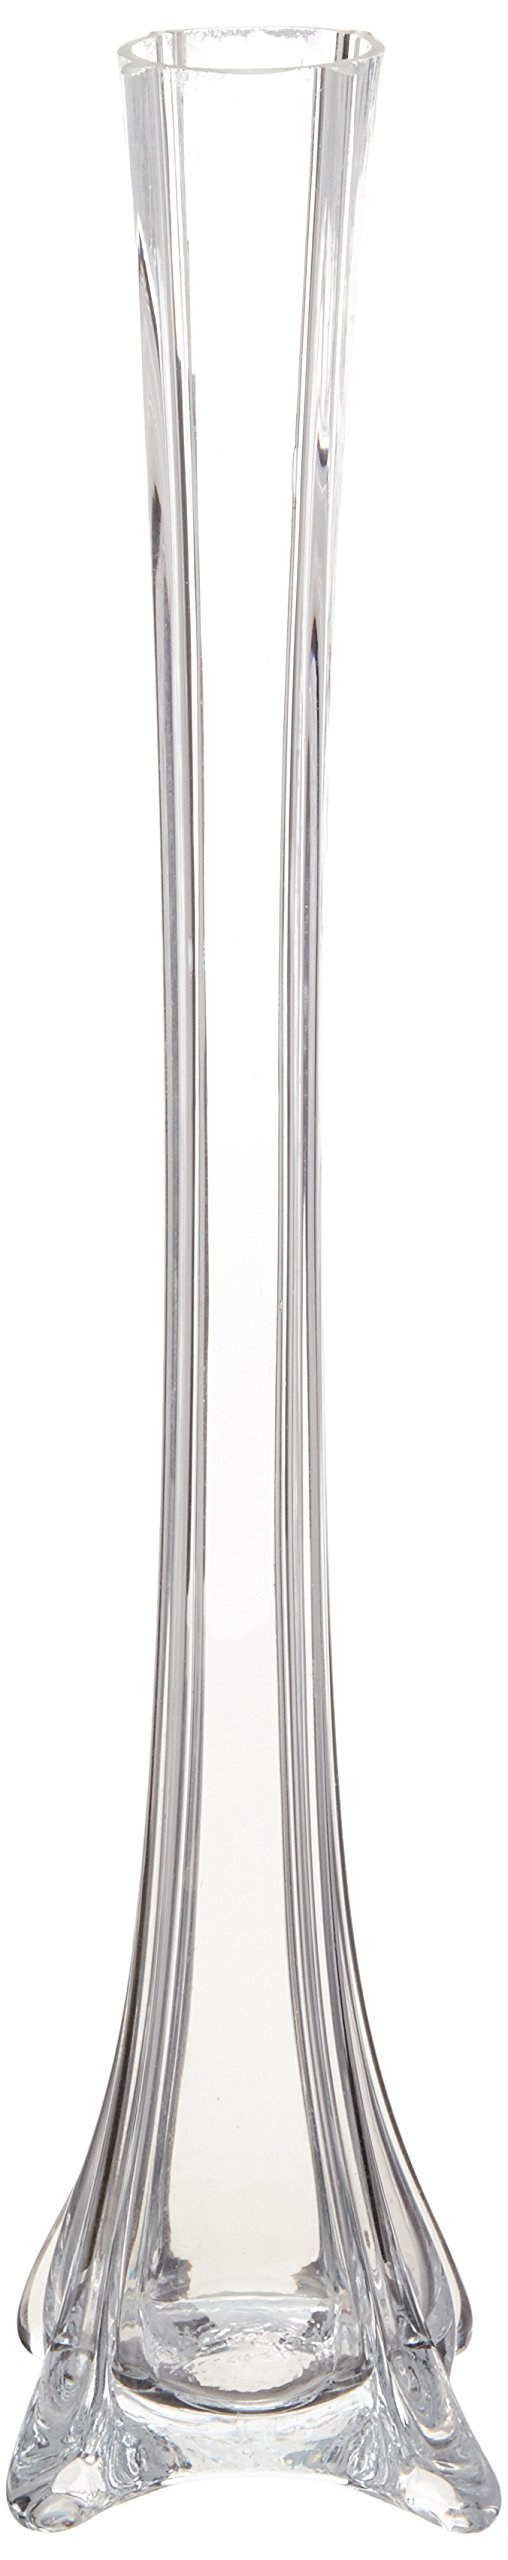 "Modern Glass Tower Vase for Wedding Height-16/"" Top white"